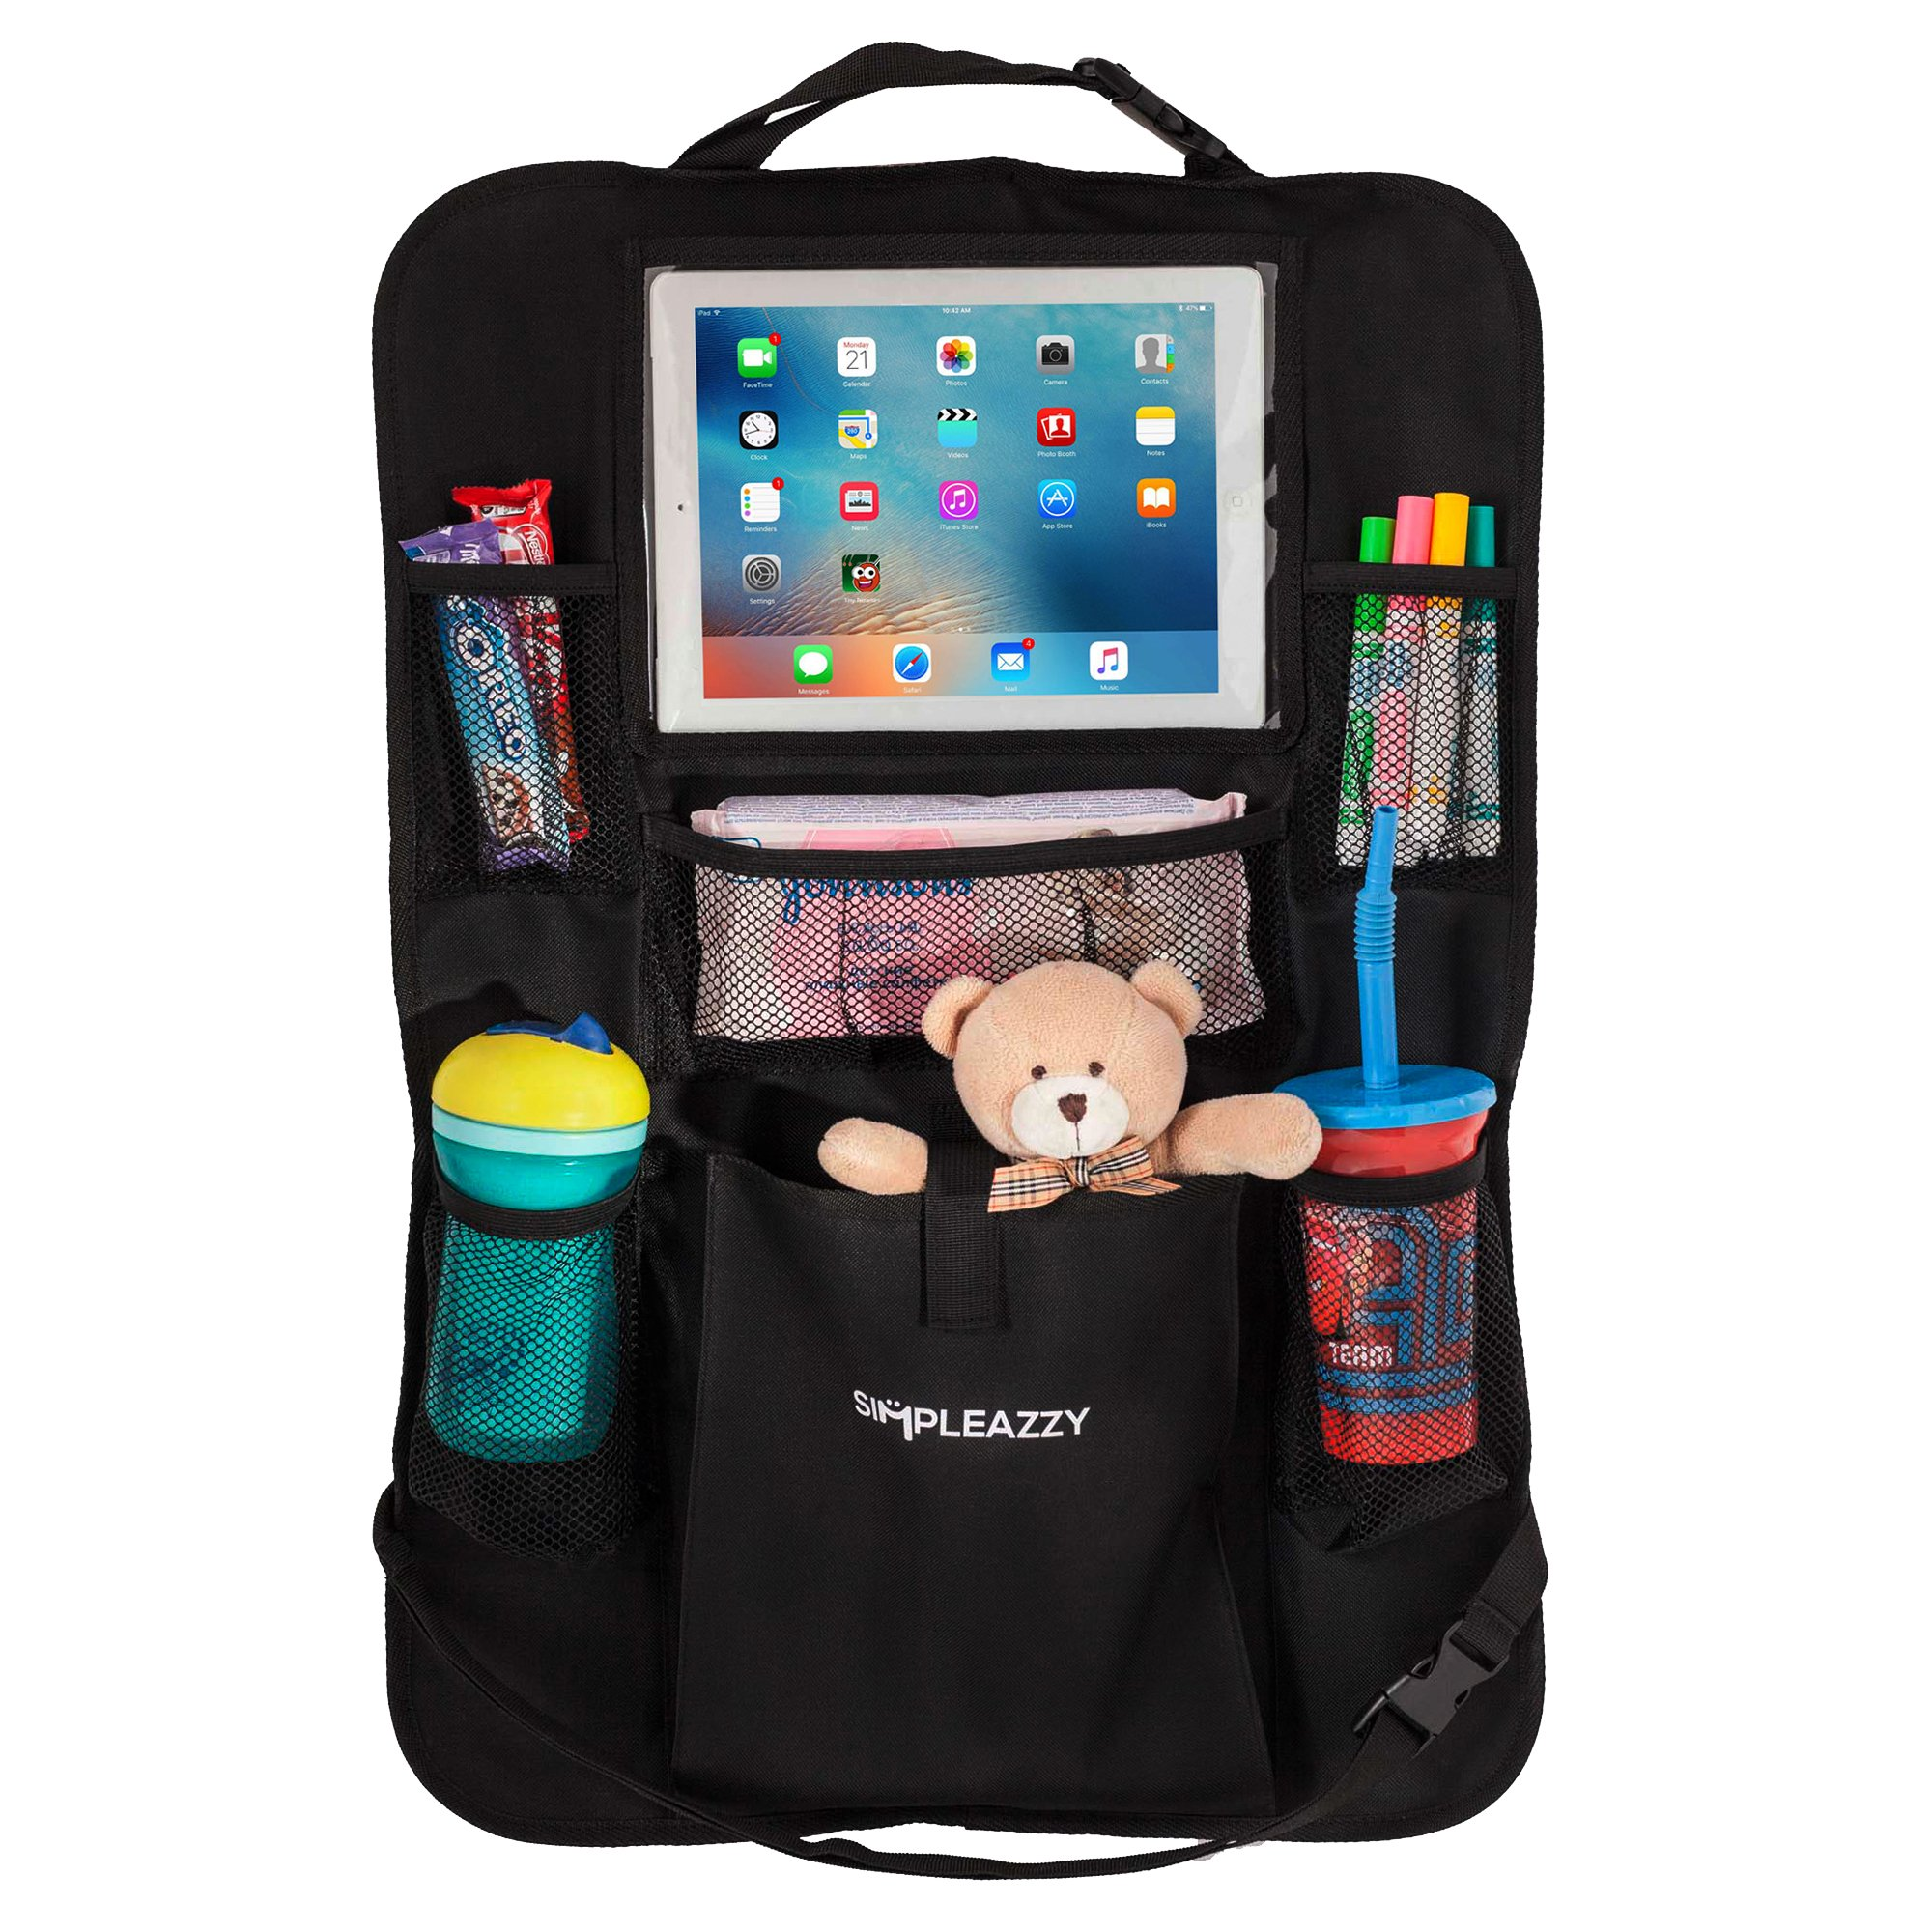 Backseat Car Organizer & Kick Mat: Back of Seat Storage & Organization for Kids by simpleazzy